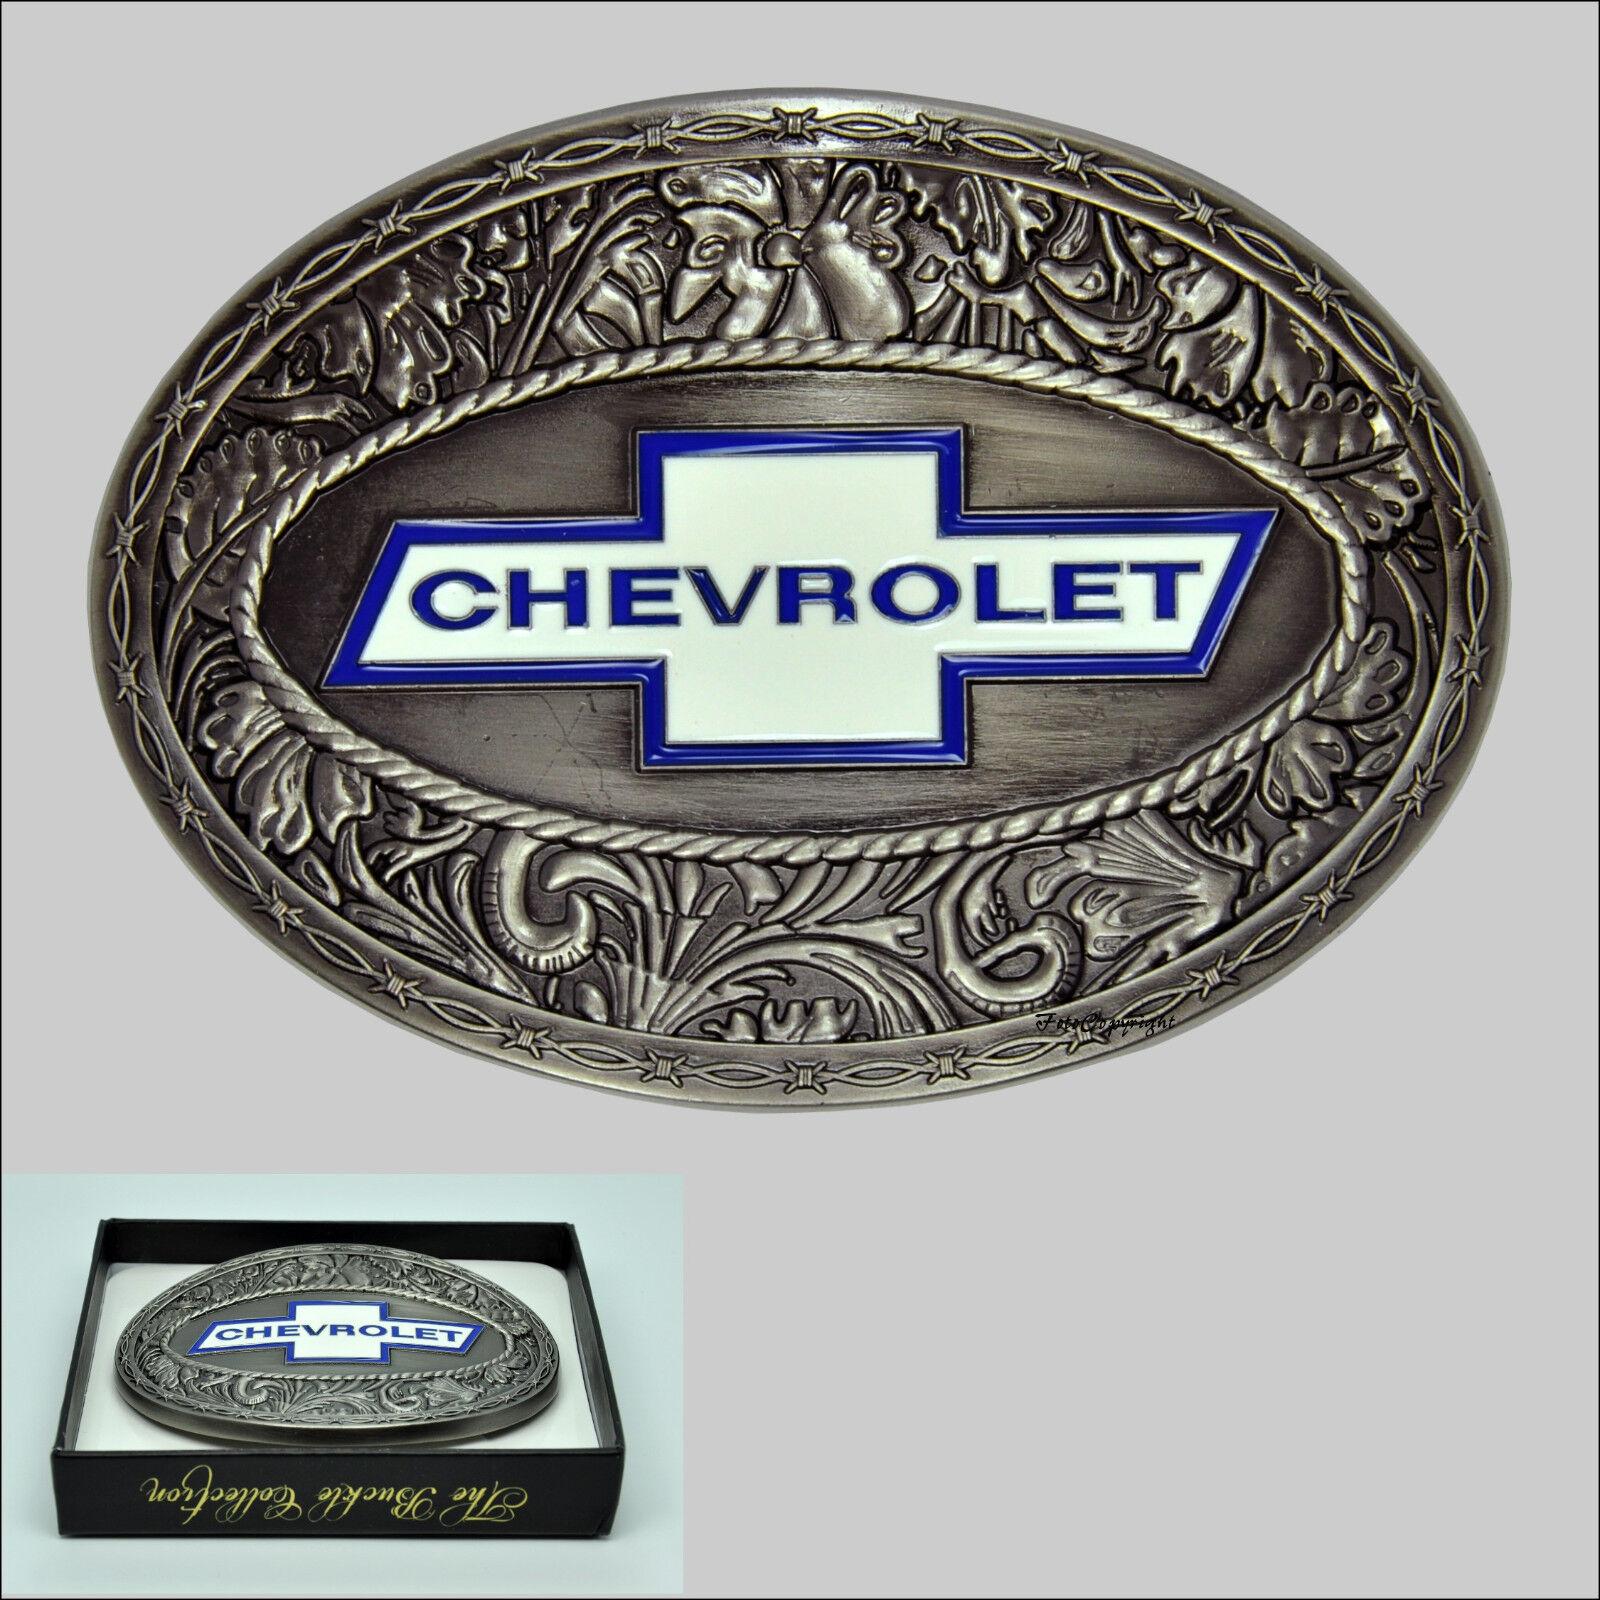 GM CHEVROLET Belt Buckle Chevy Logo Emblem Bowtie Lizenz Gürtelschnalle *620